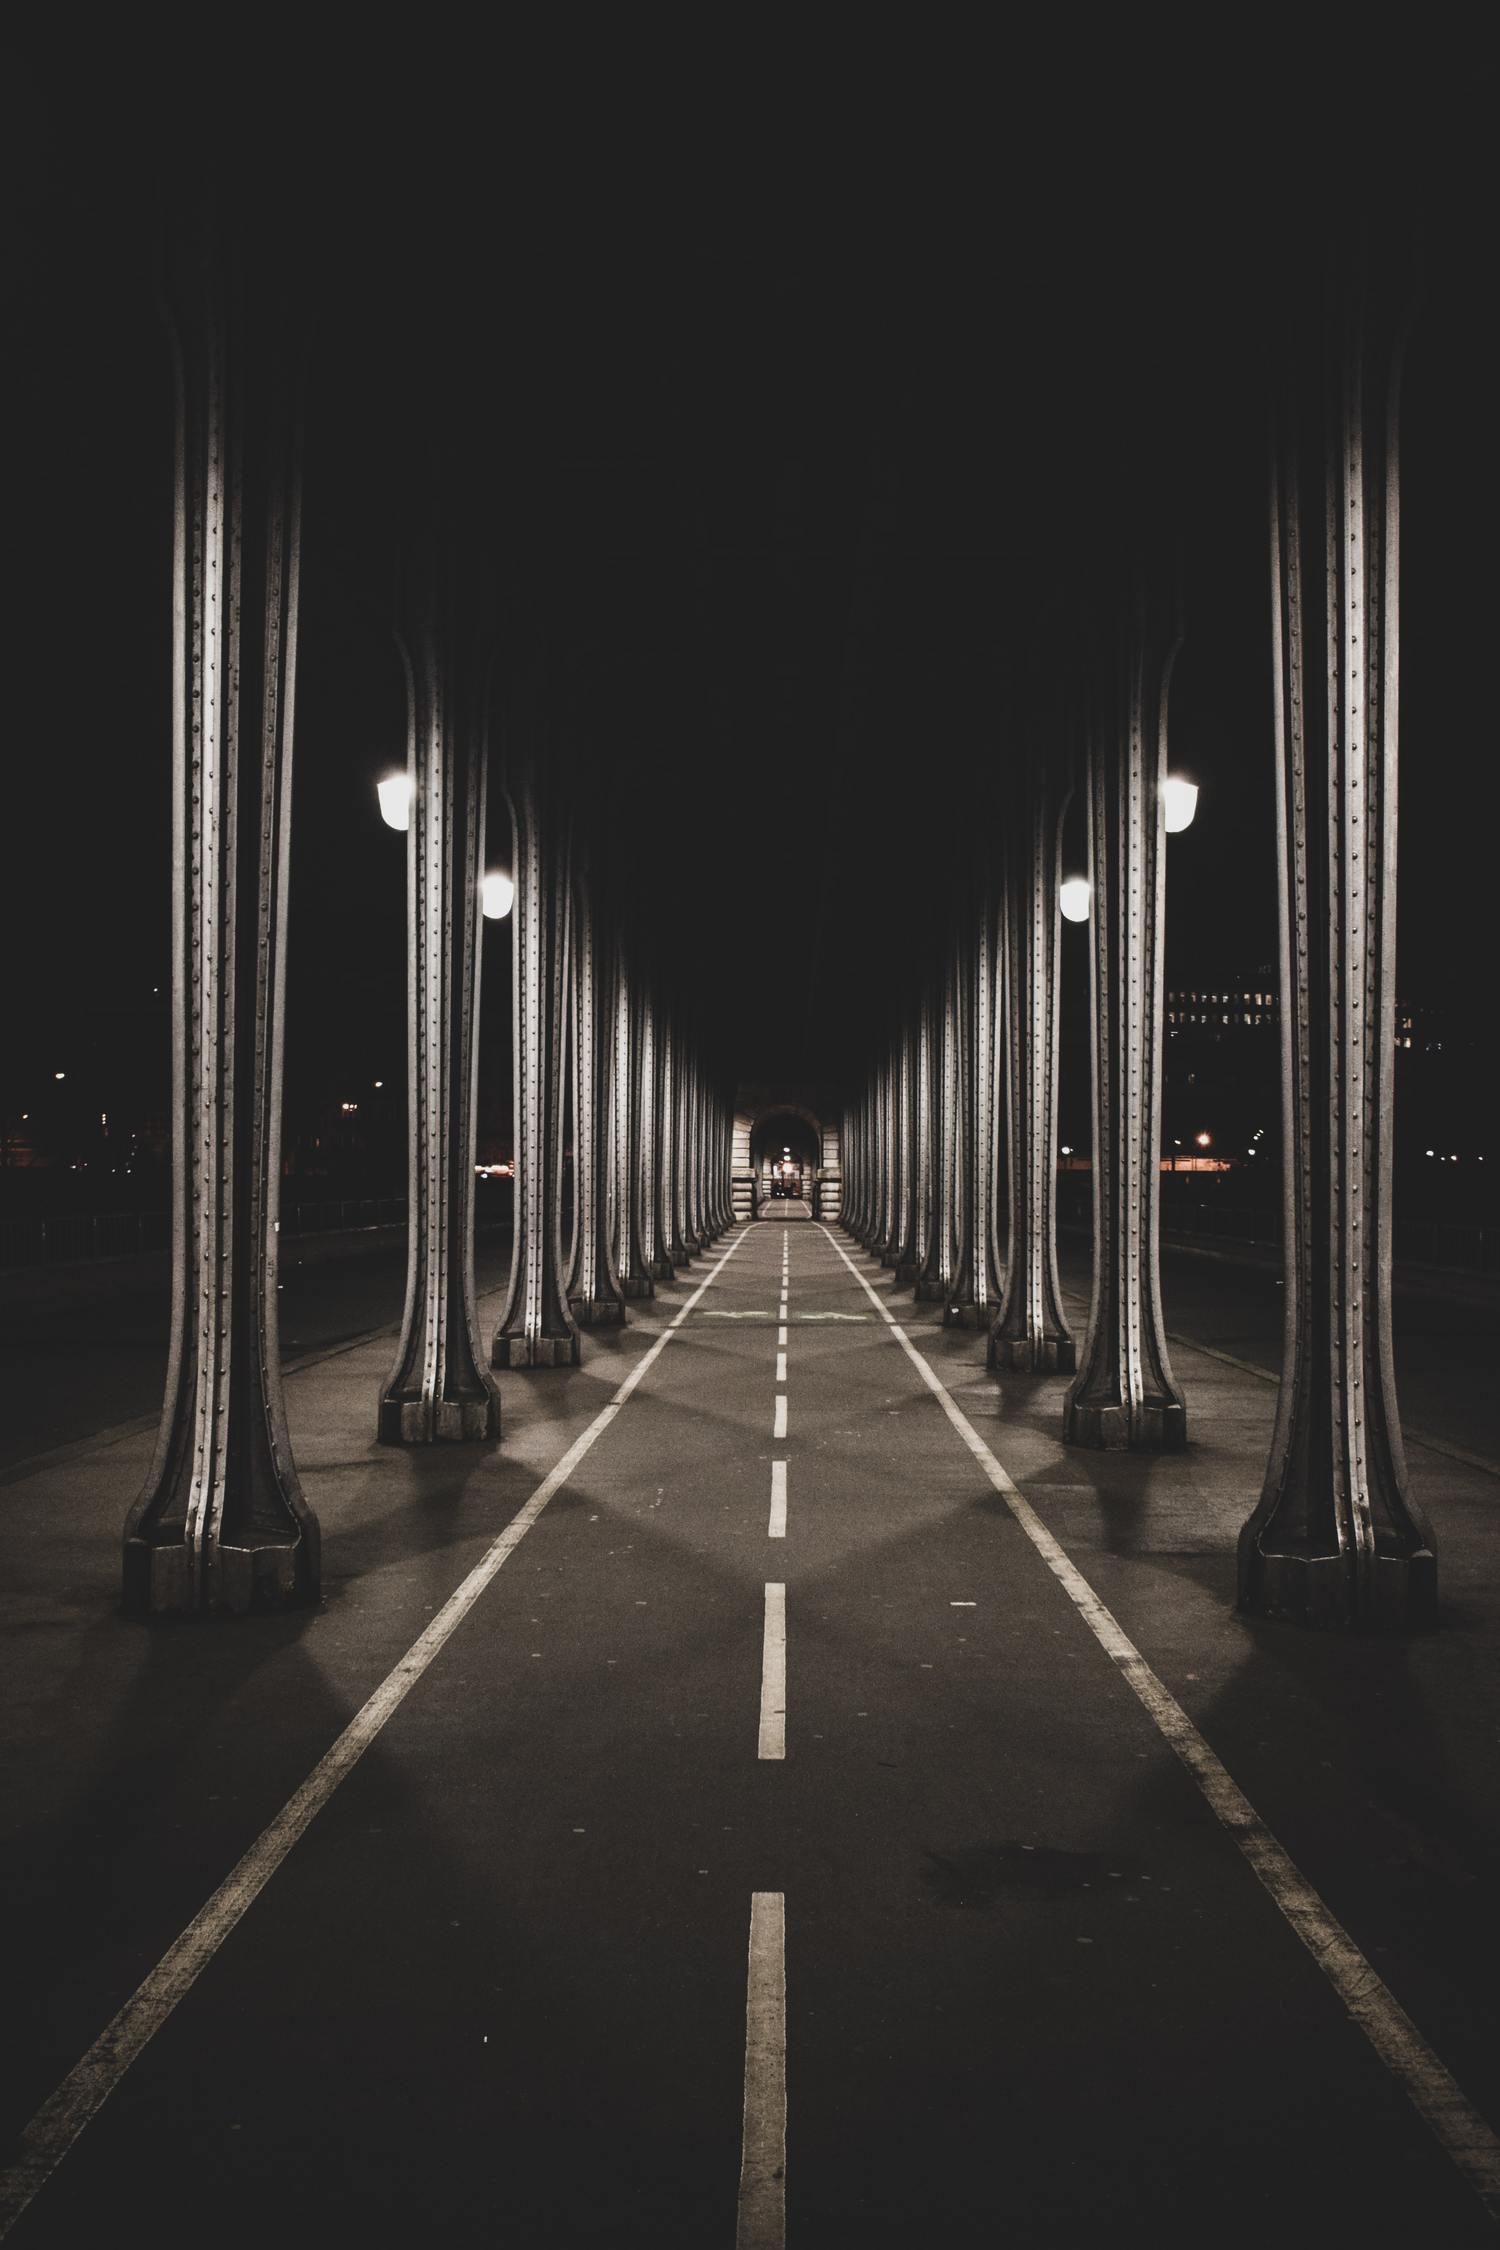 Composición fotográfica basada en líneas